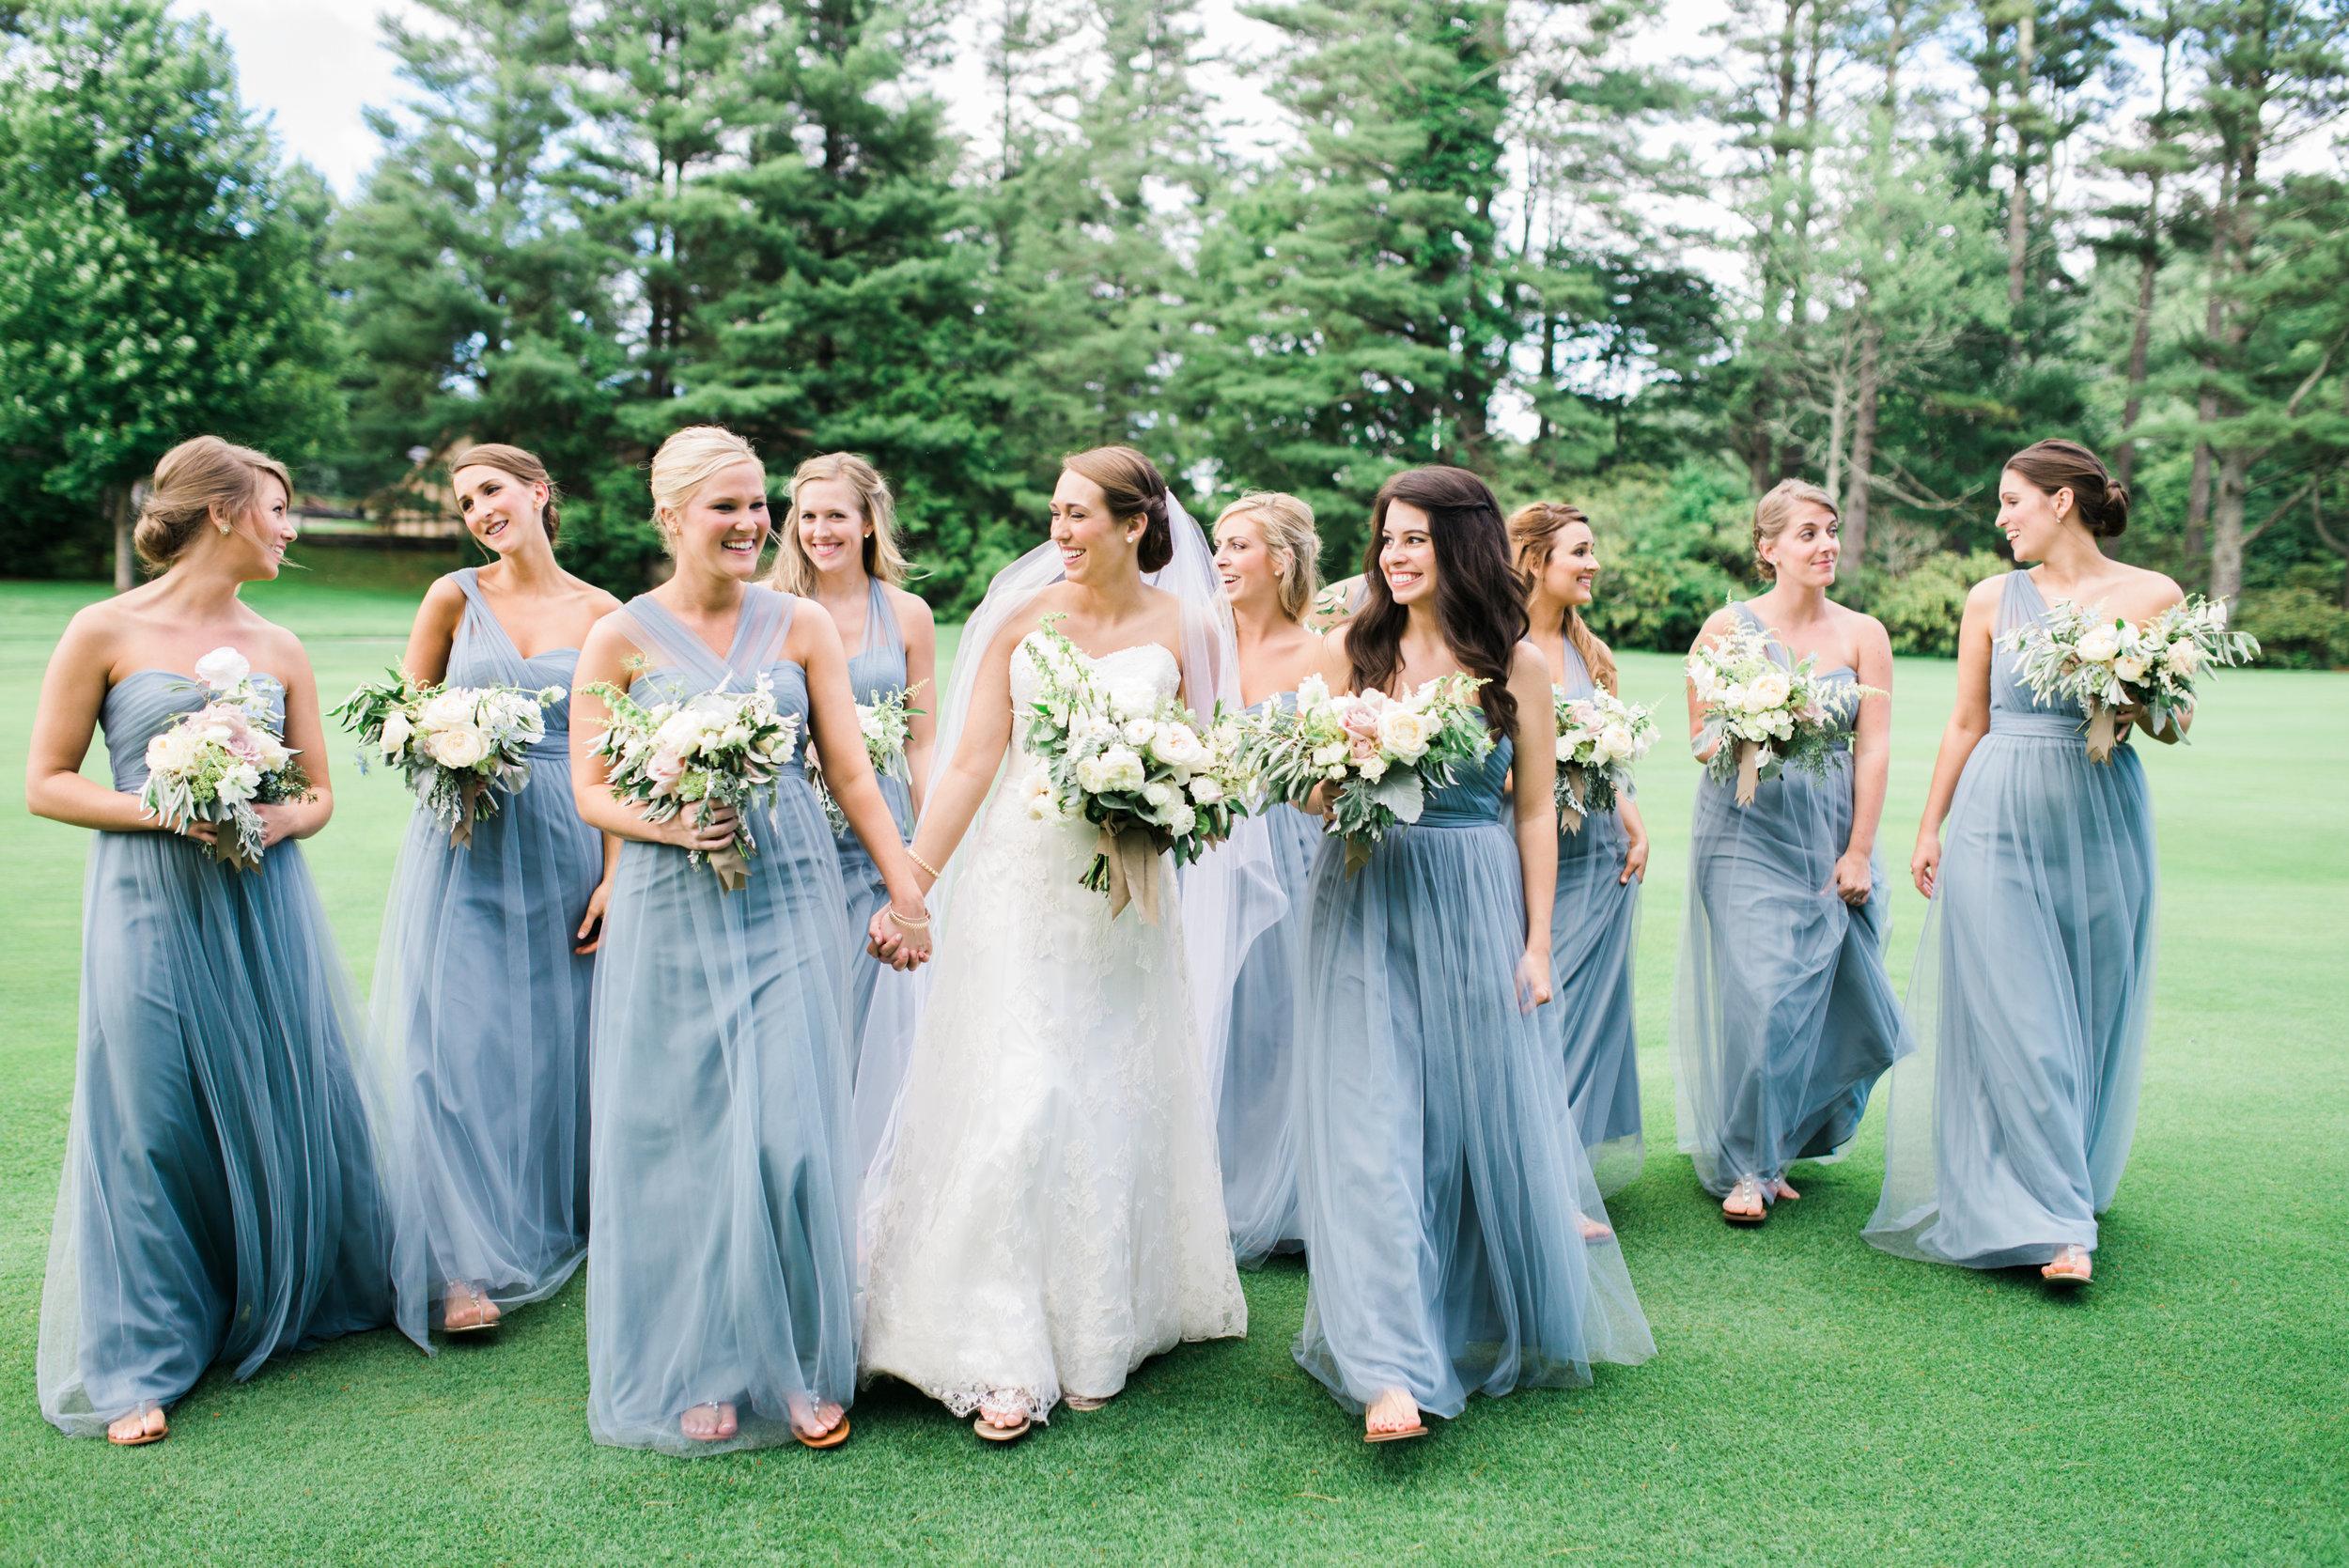 Robbins wedding 339.jpg